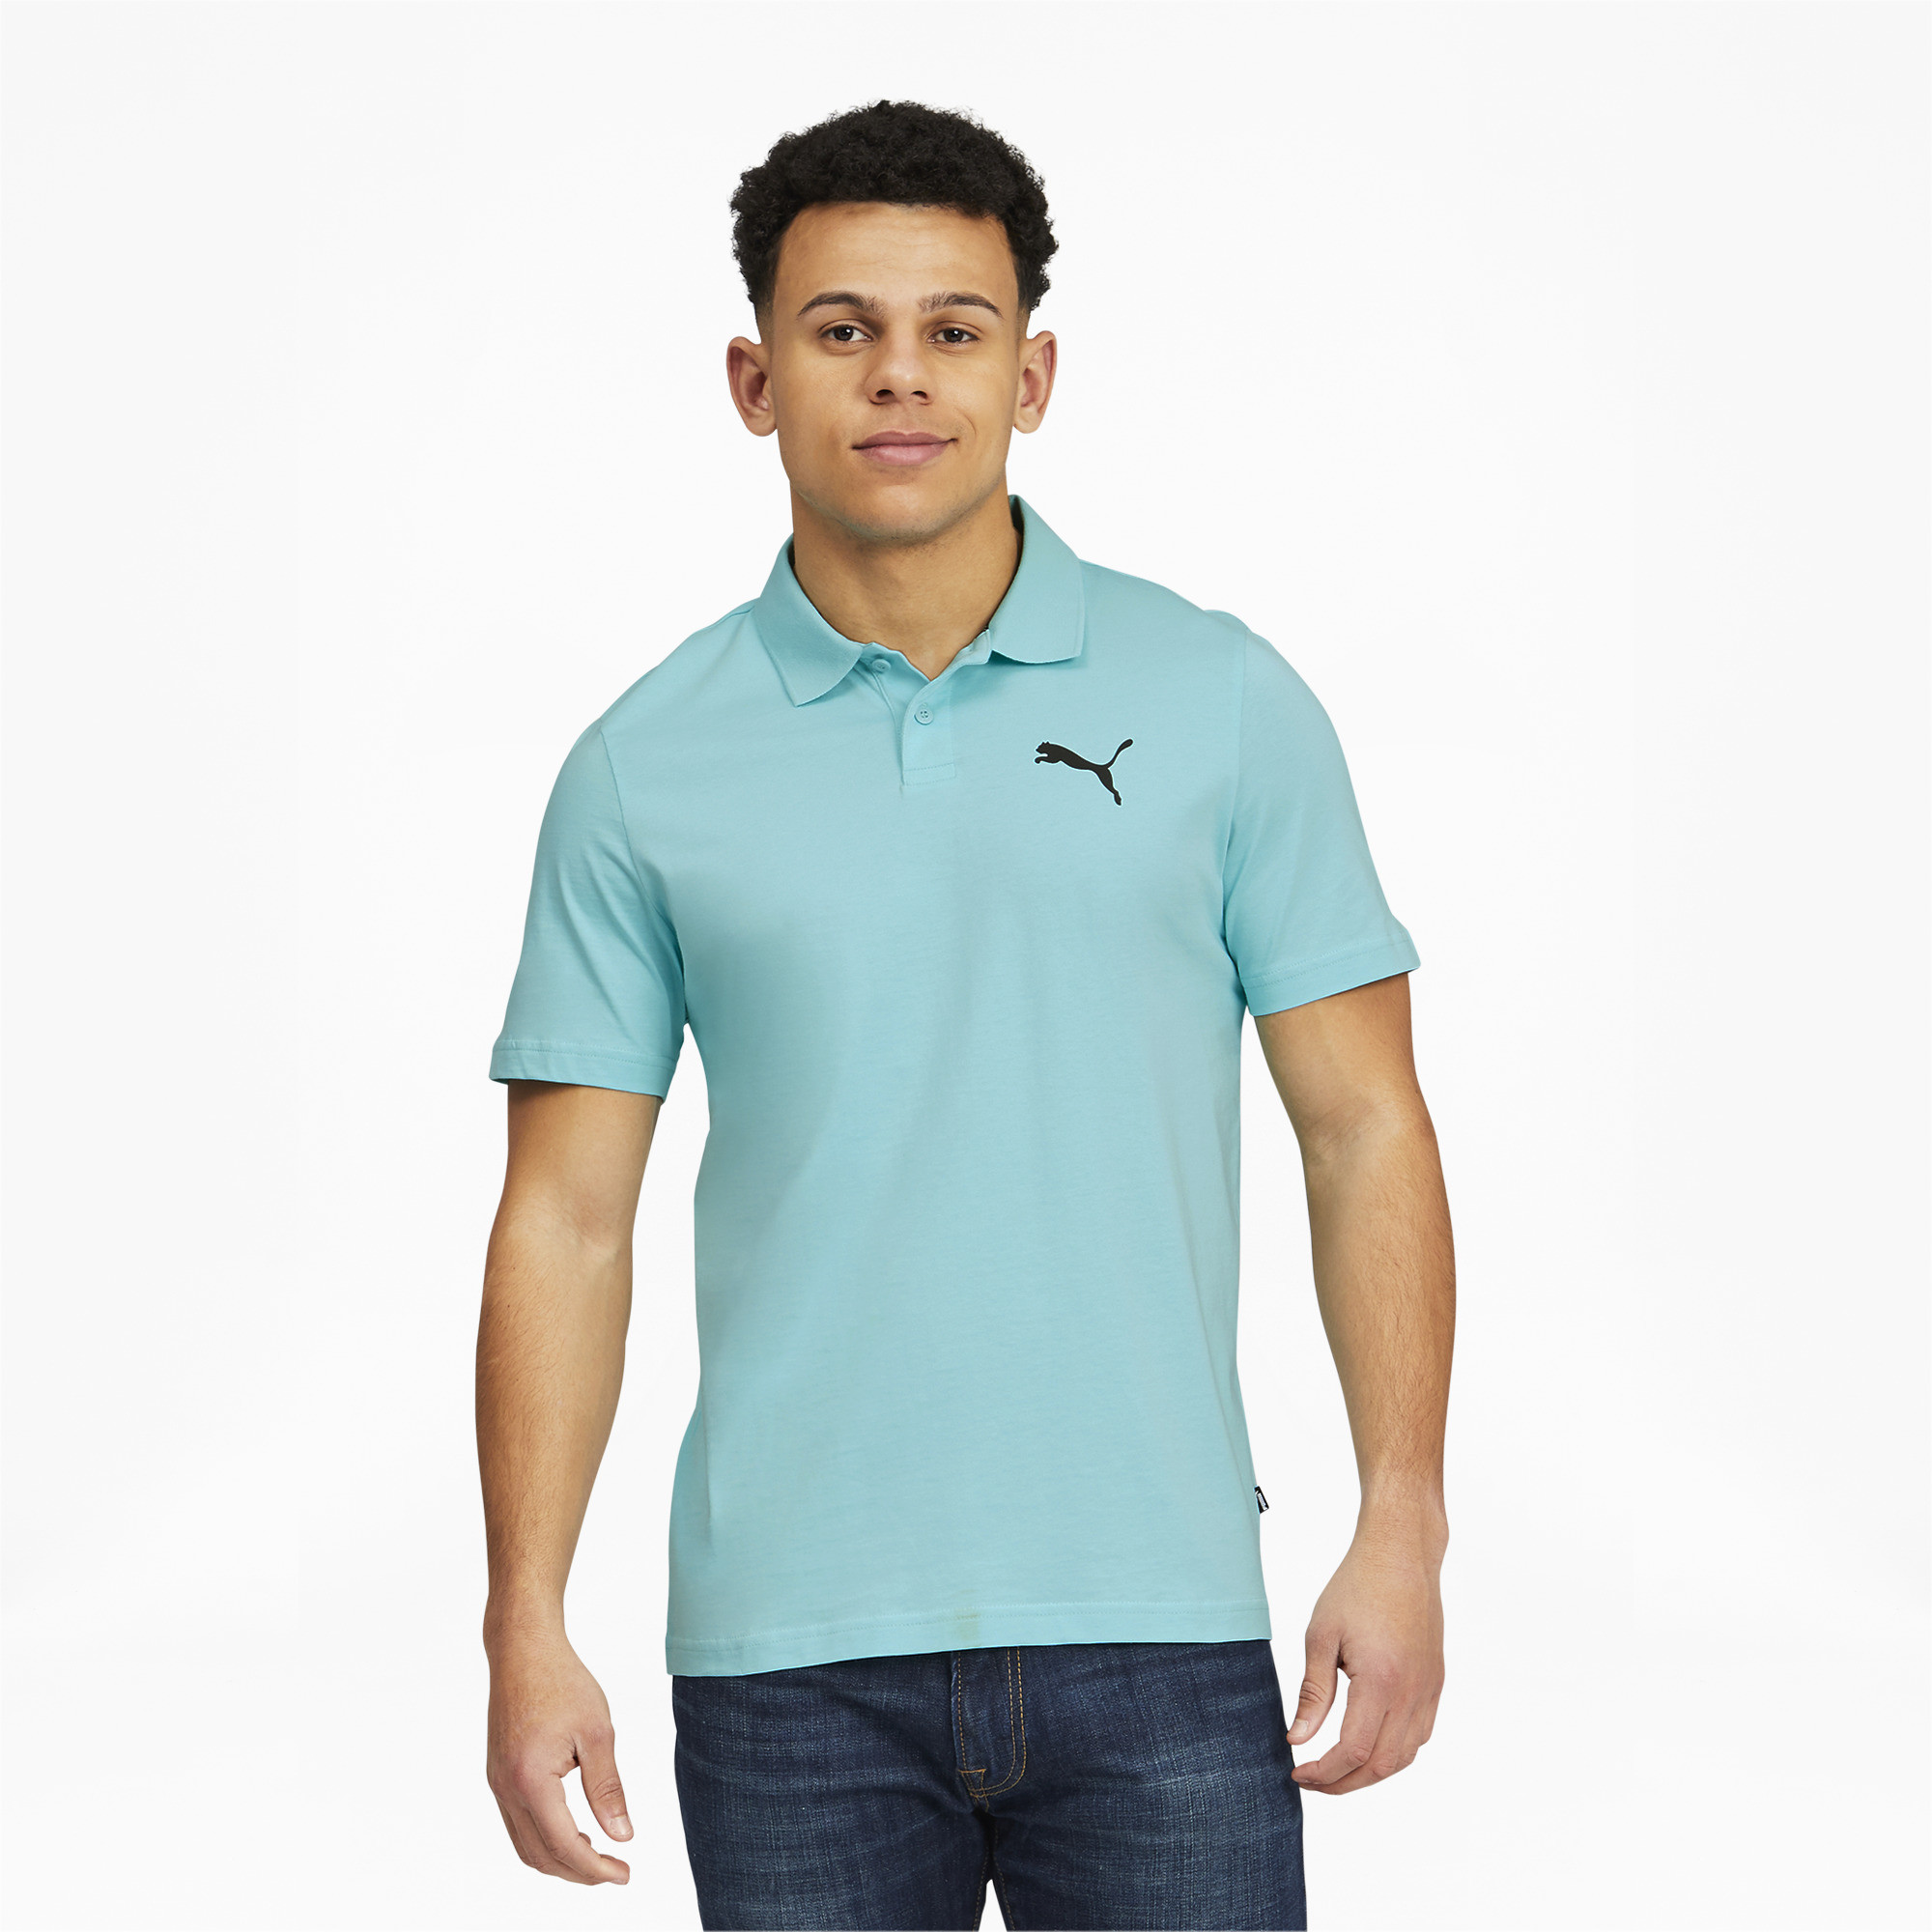 thumbnail 4 - PUMA Men's Essentials Jersey Polo